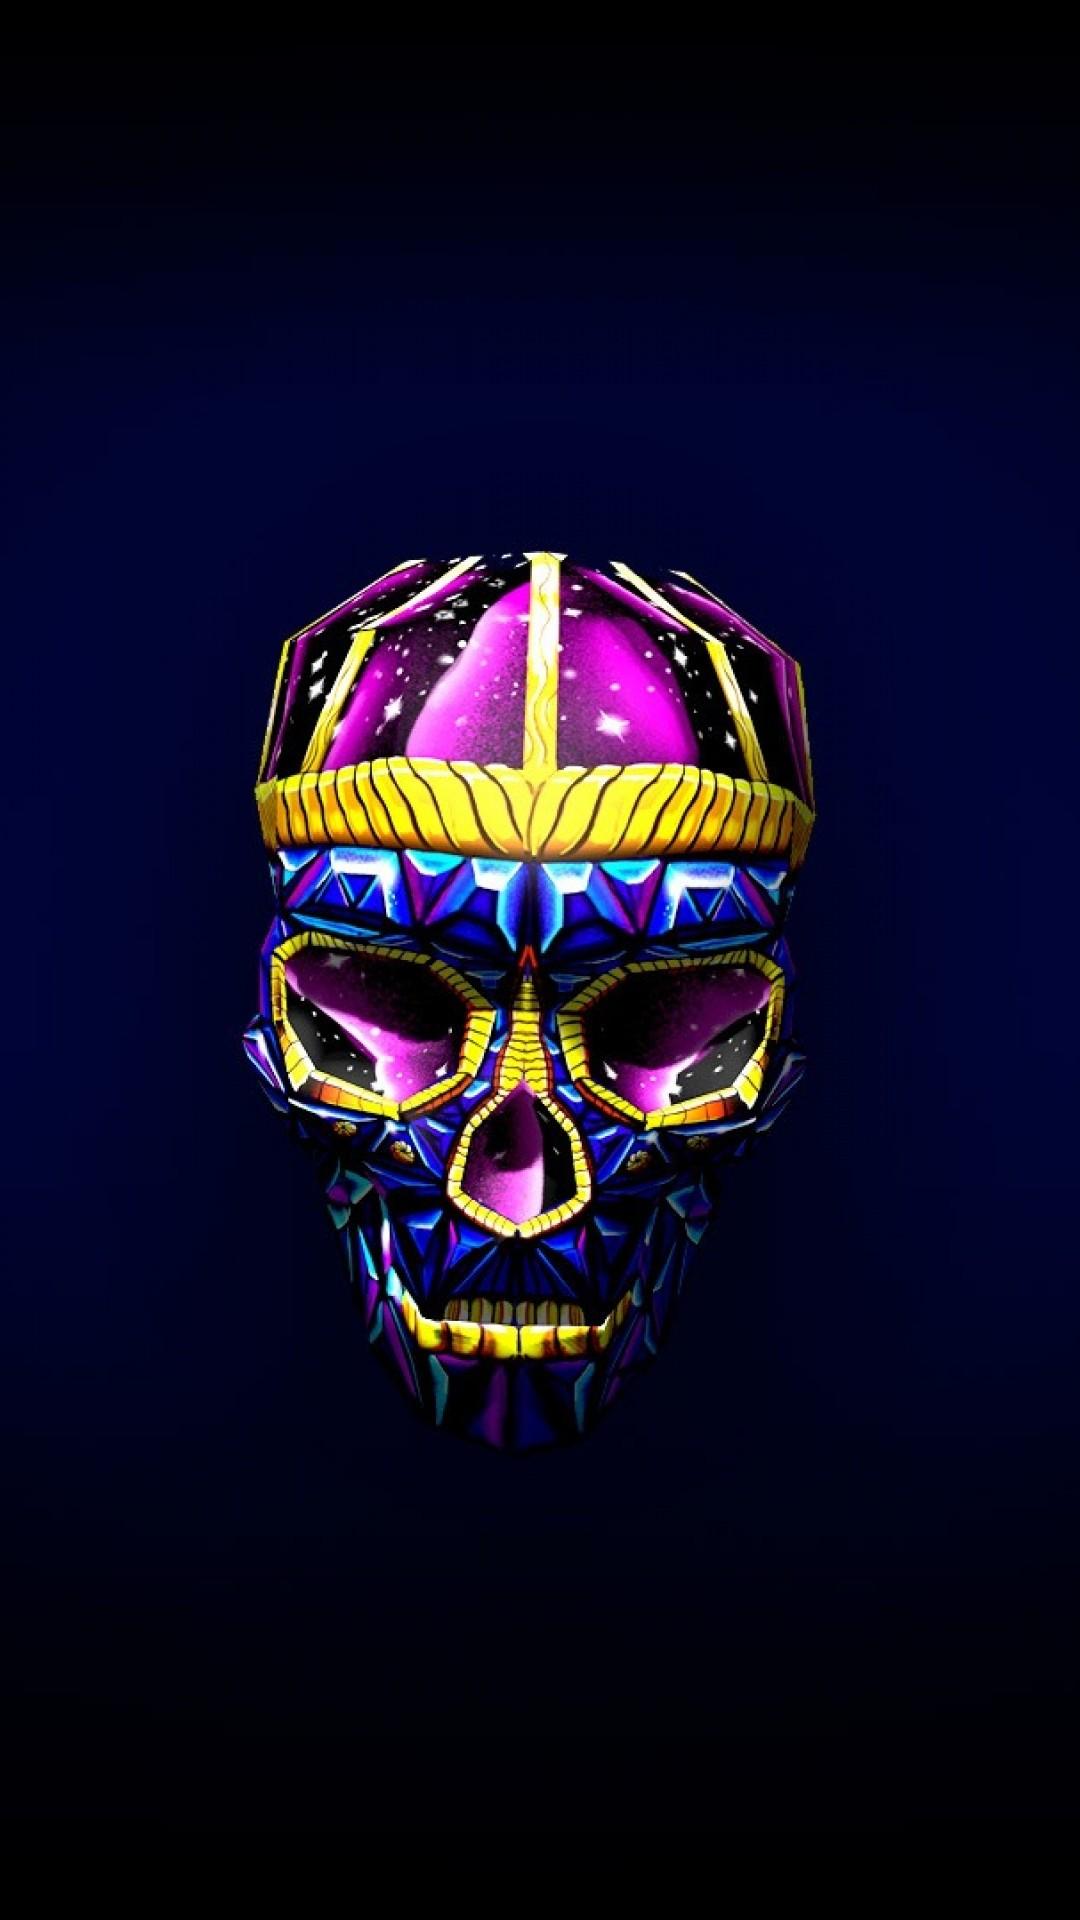 Preview wallpaper skull, art, bright, 3d 1080×1920